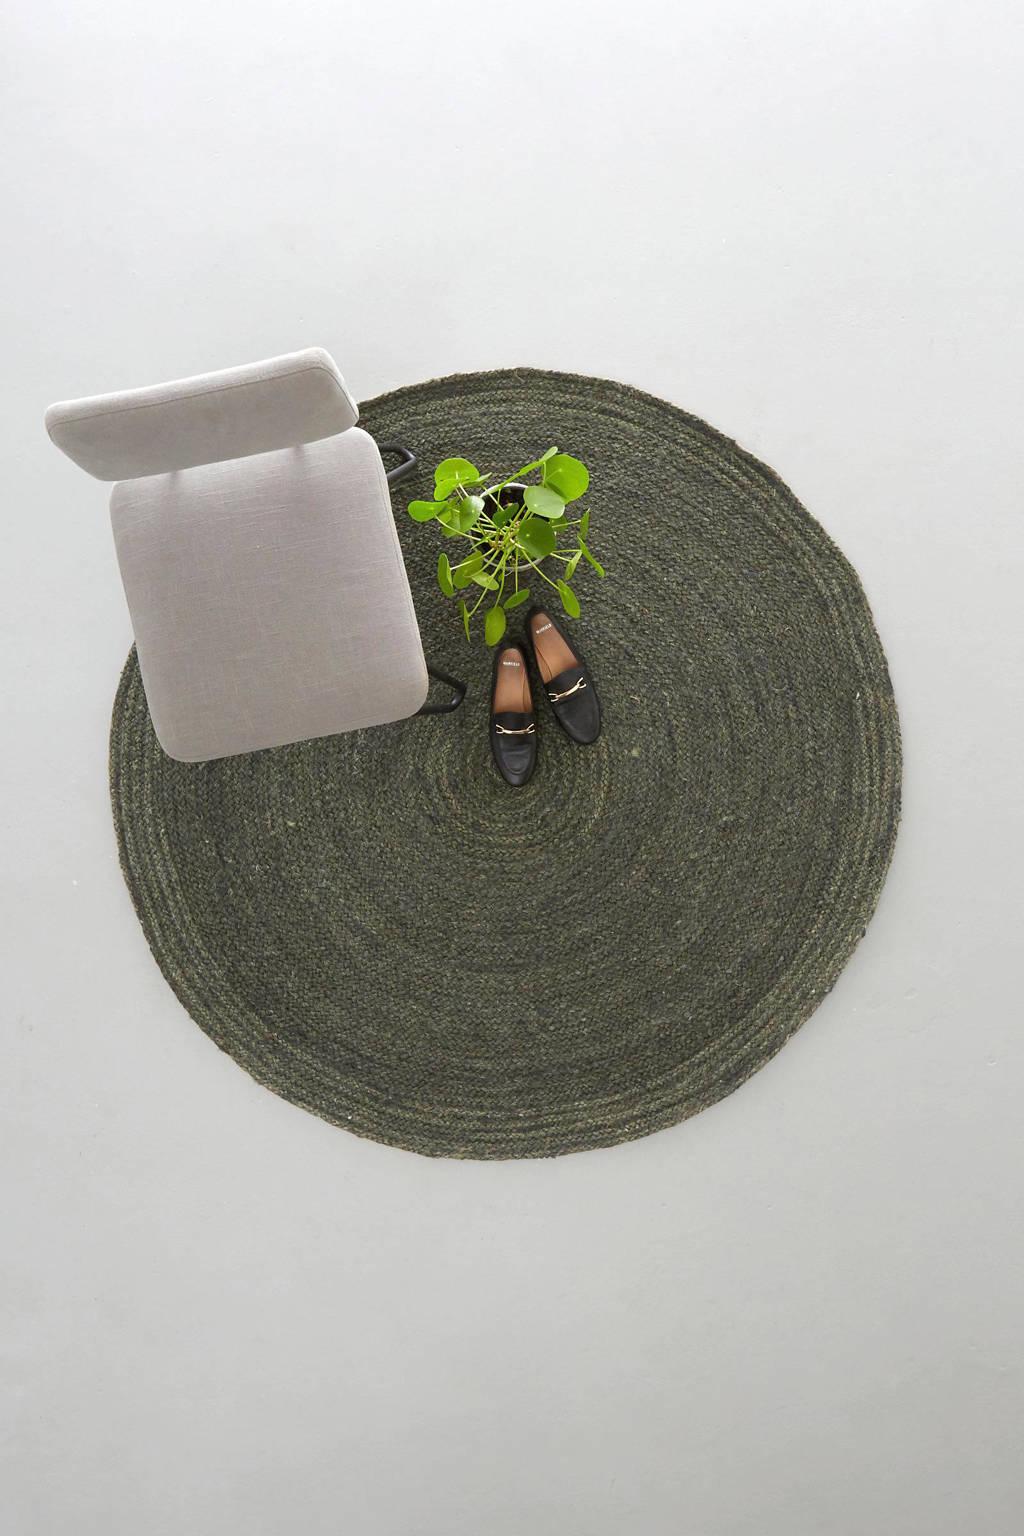 whkmp's own vloerkleed  (⌀150 cm), Groen